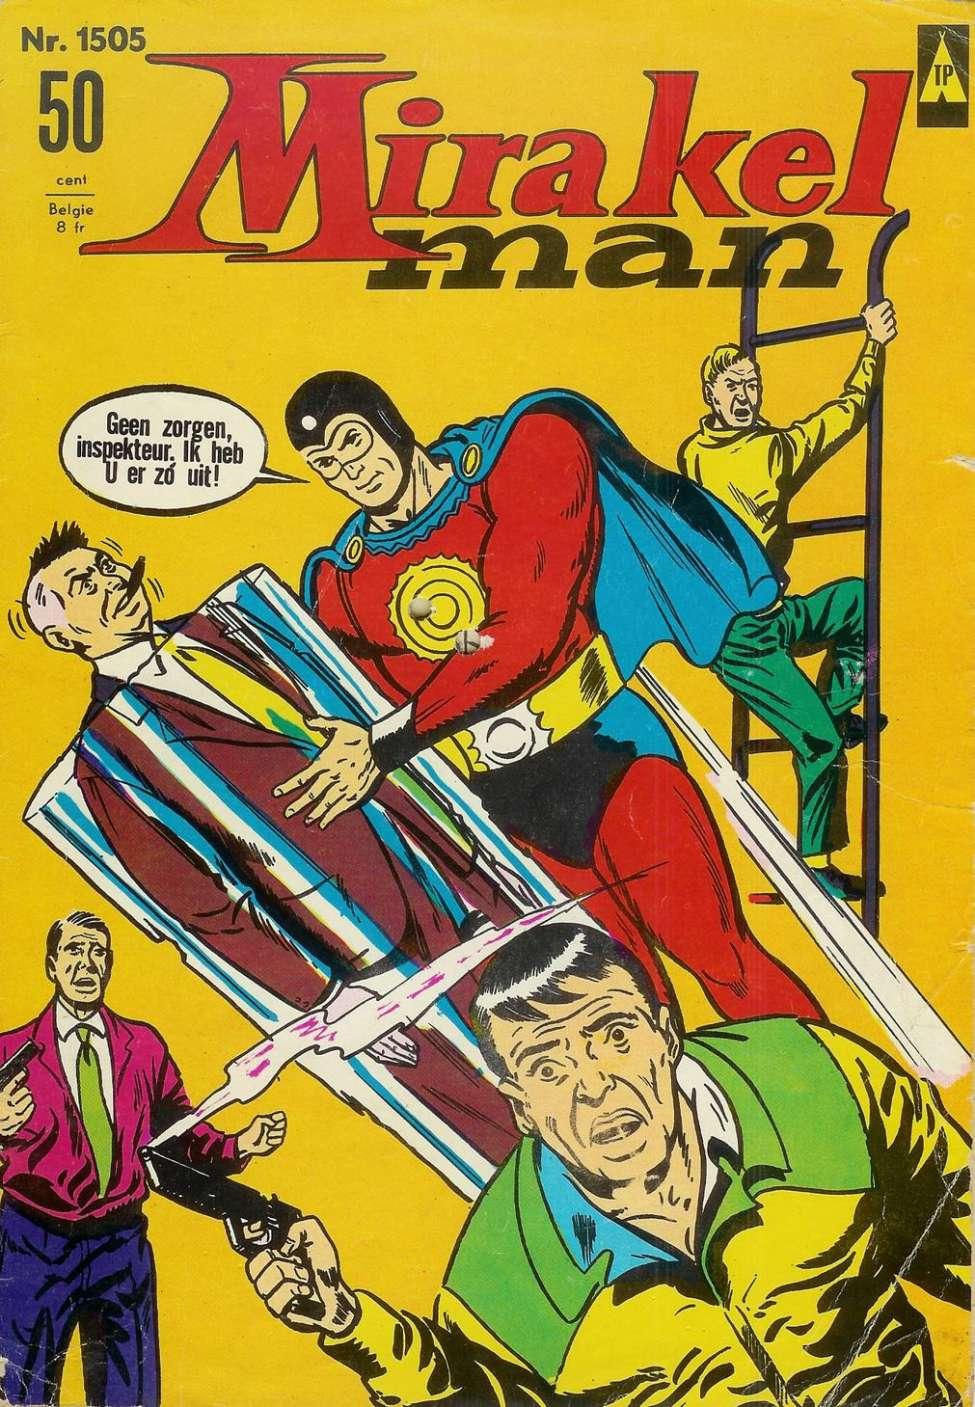 Comic Book Cover For Mirakelman #1505